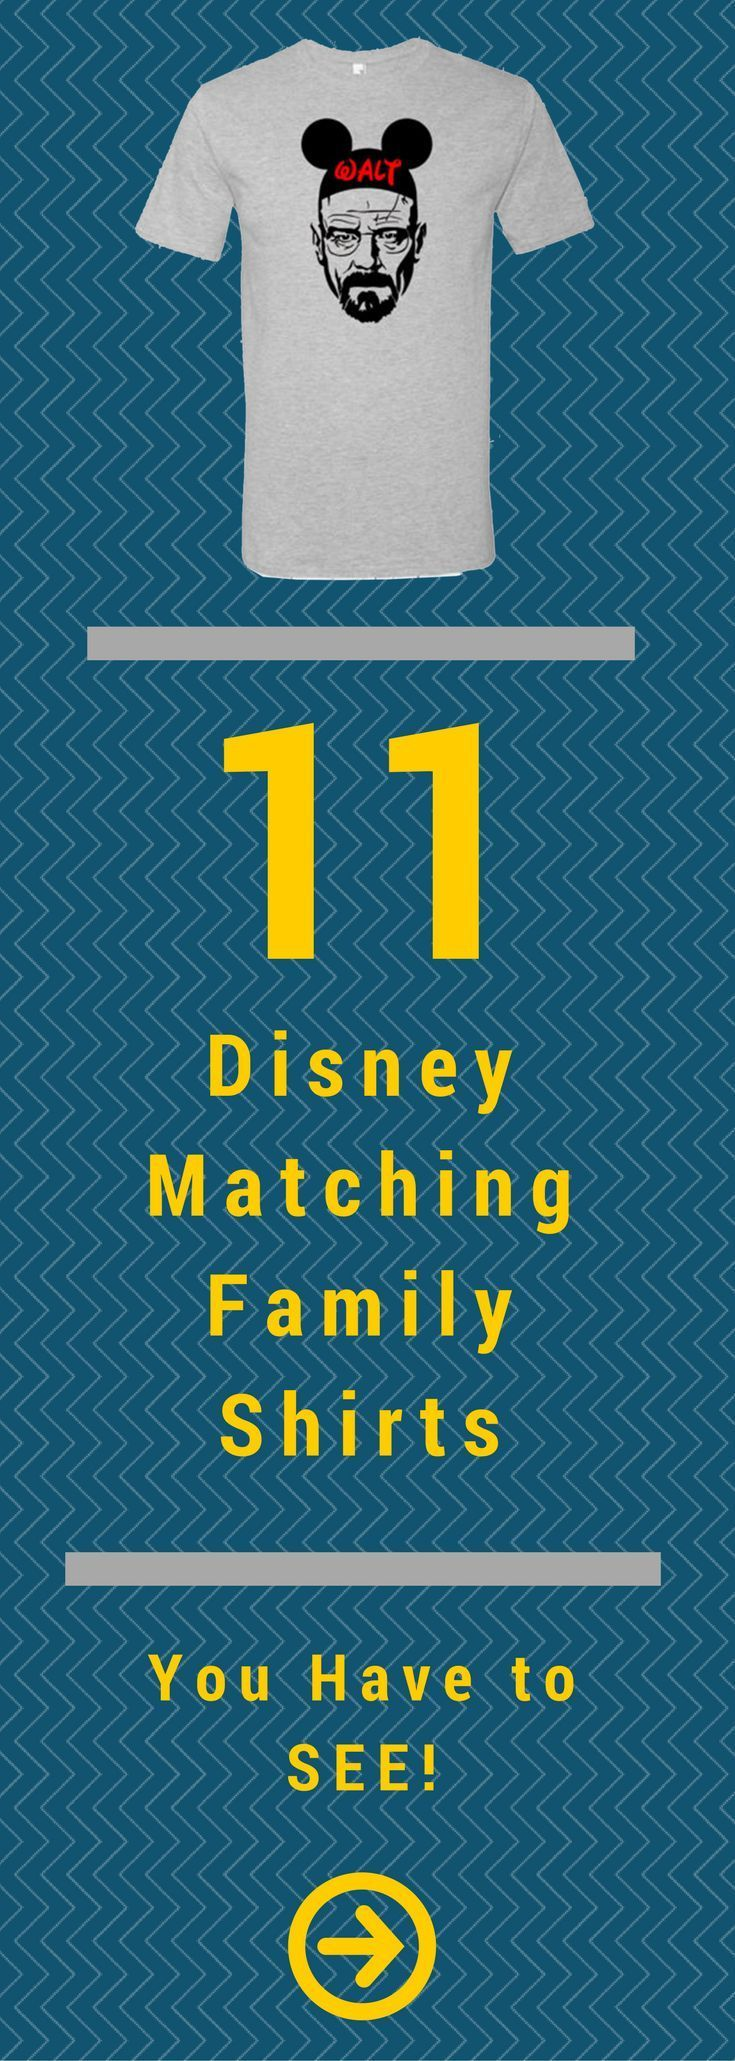 11 Disney Matching Family Shirts You Have to See! #disneyfamily #disney via @globalmunchkins